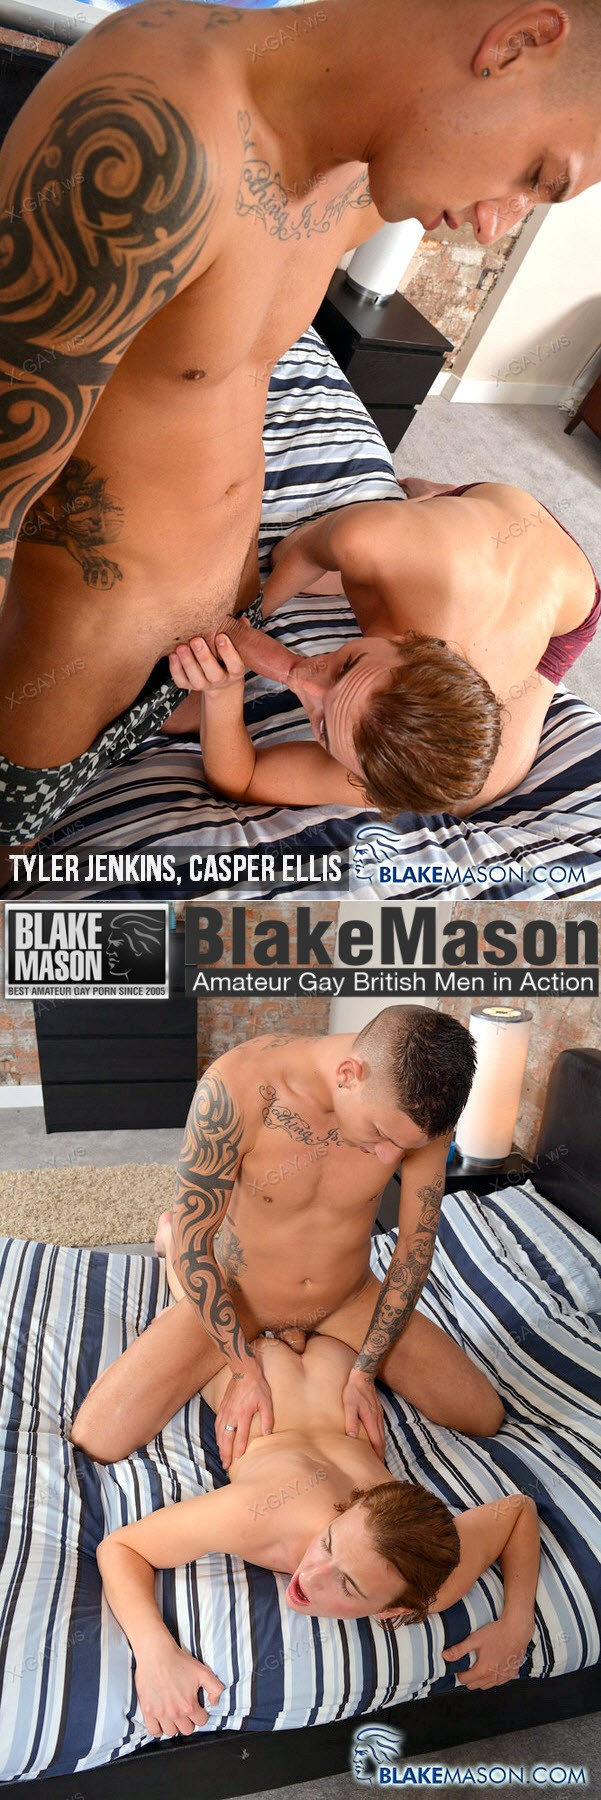 BlakeMason: Tyler Jenkins, Casper Ellis